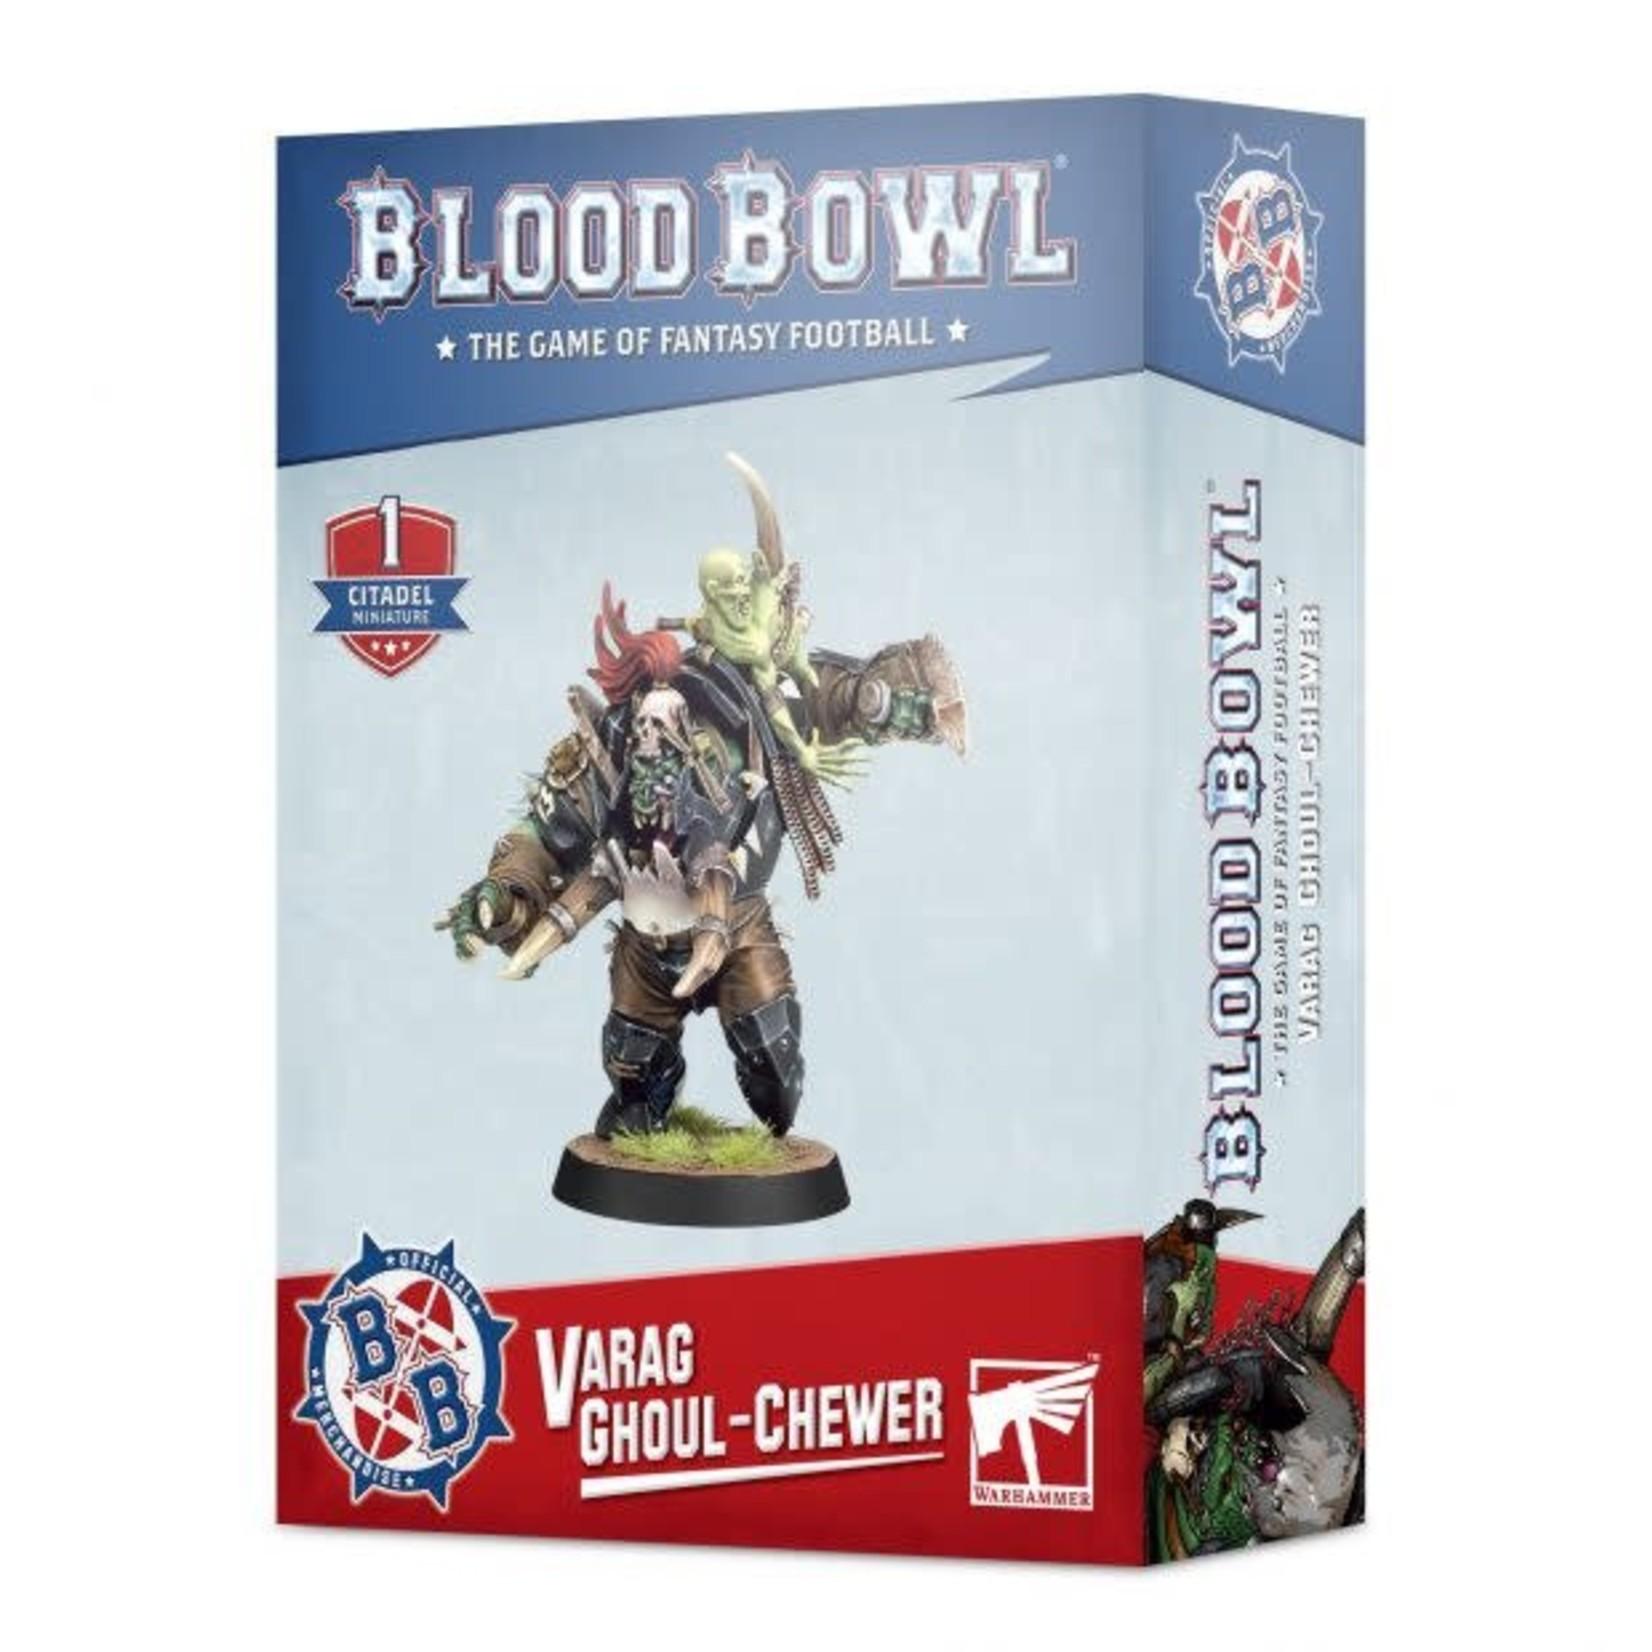 Blood Bowl BloodBowl - Varag Ghoul-Chewer